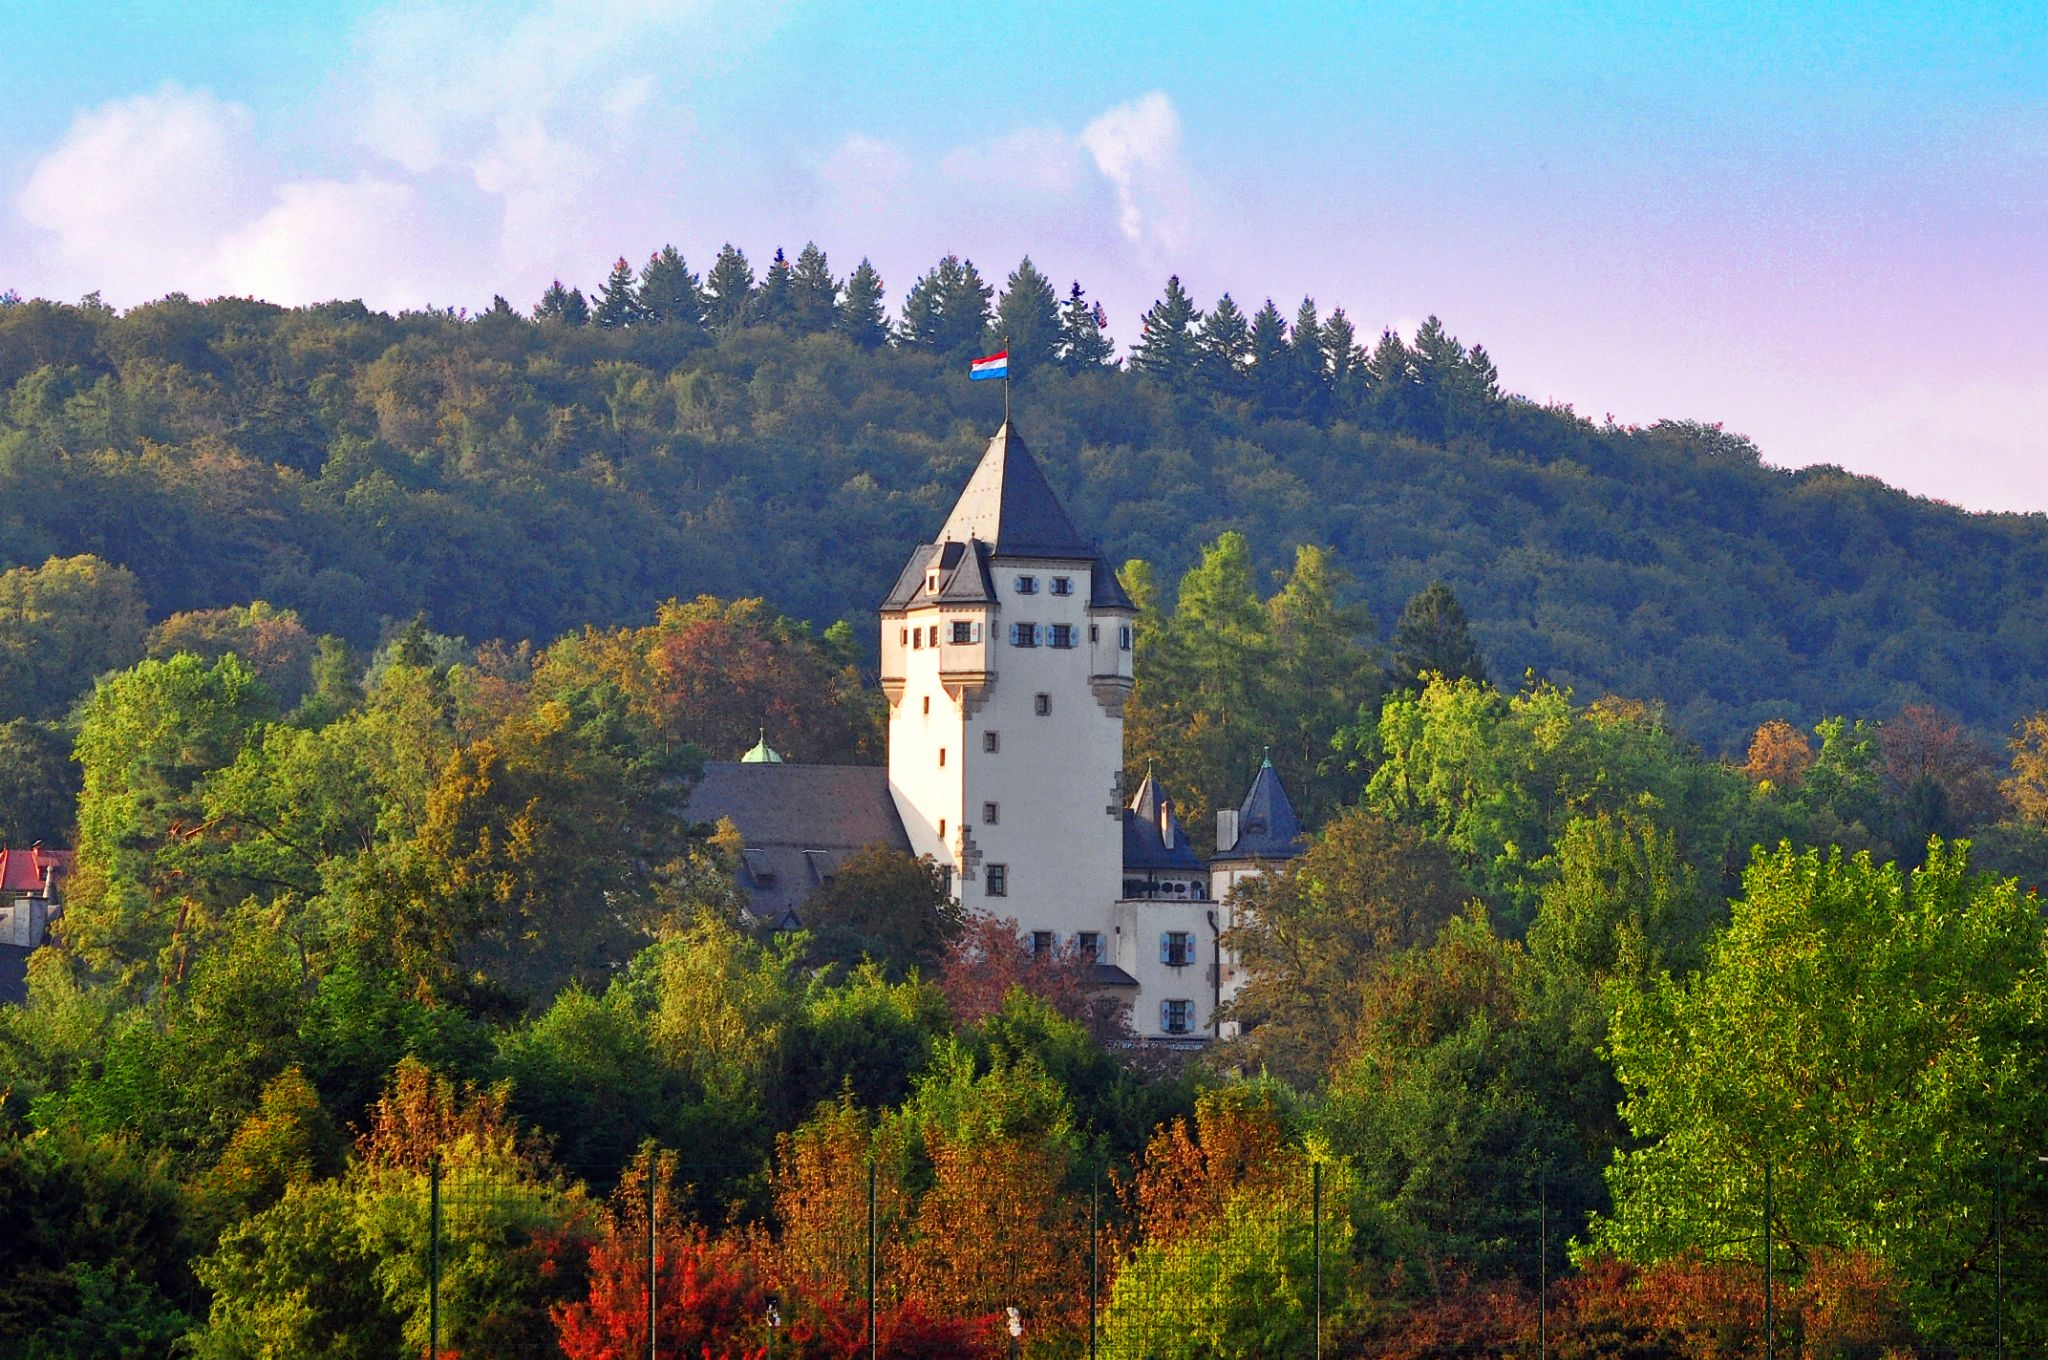 Grand-Duke's Home by Marco Bertamé